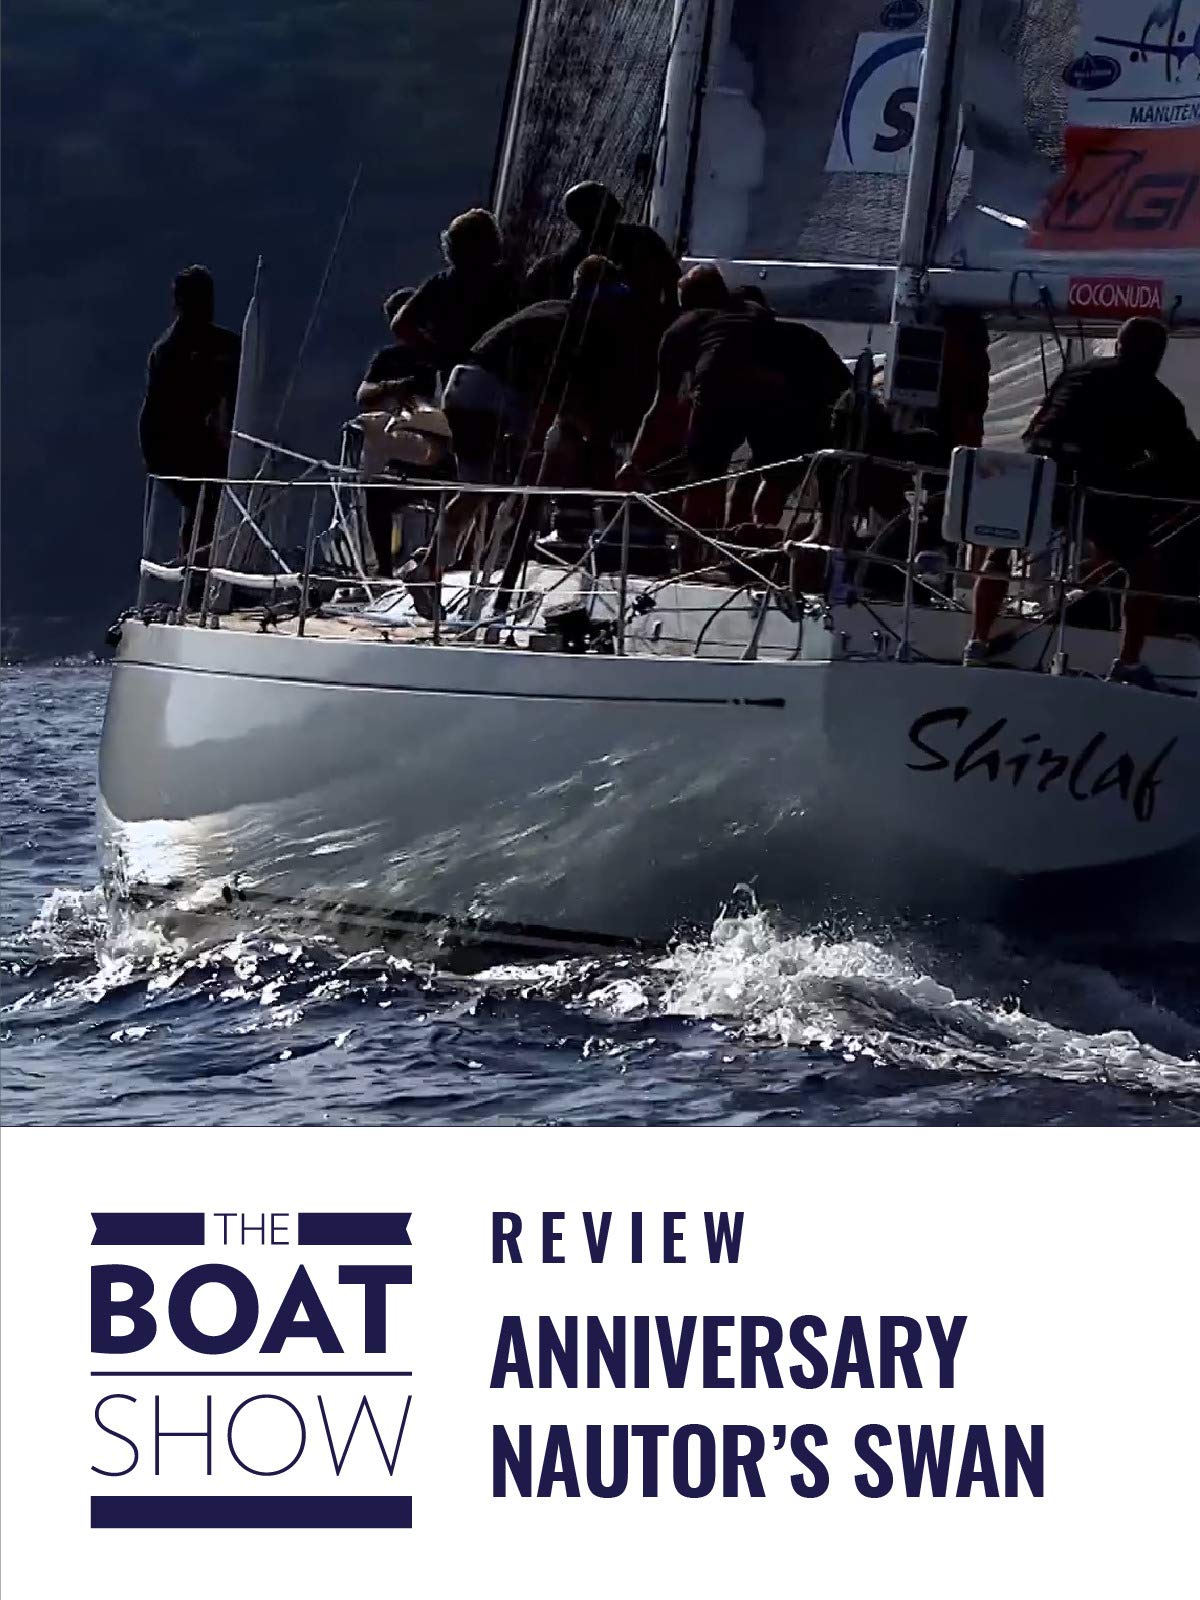 Clip: Nautor's Swan 50th Anniversary - The Boat Show